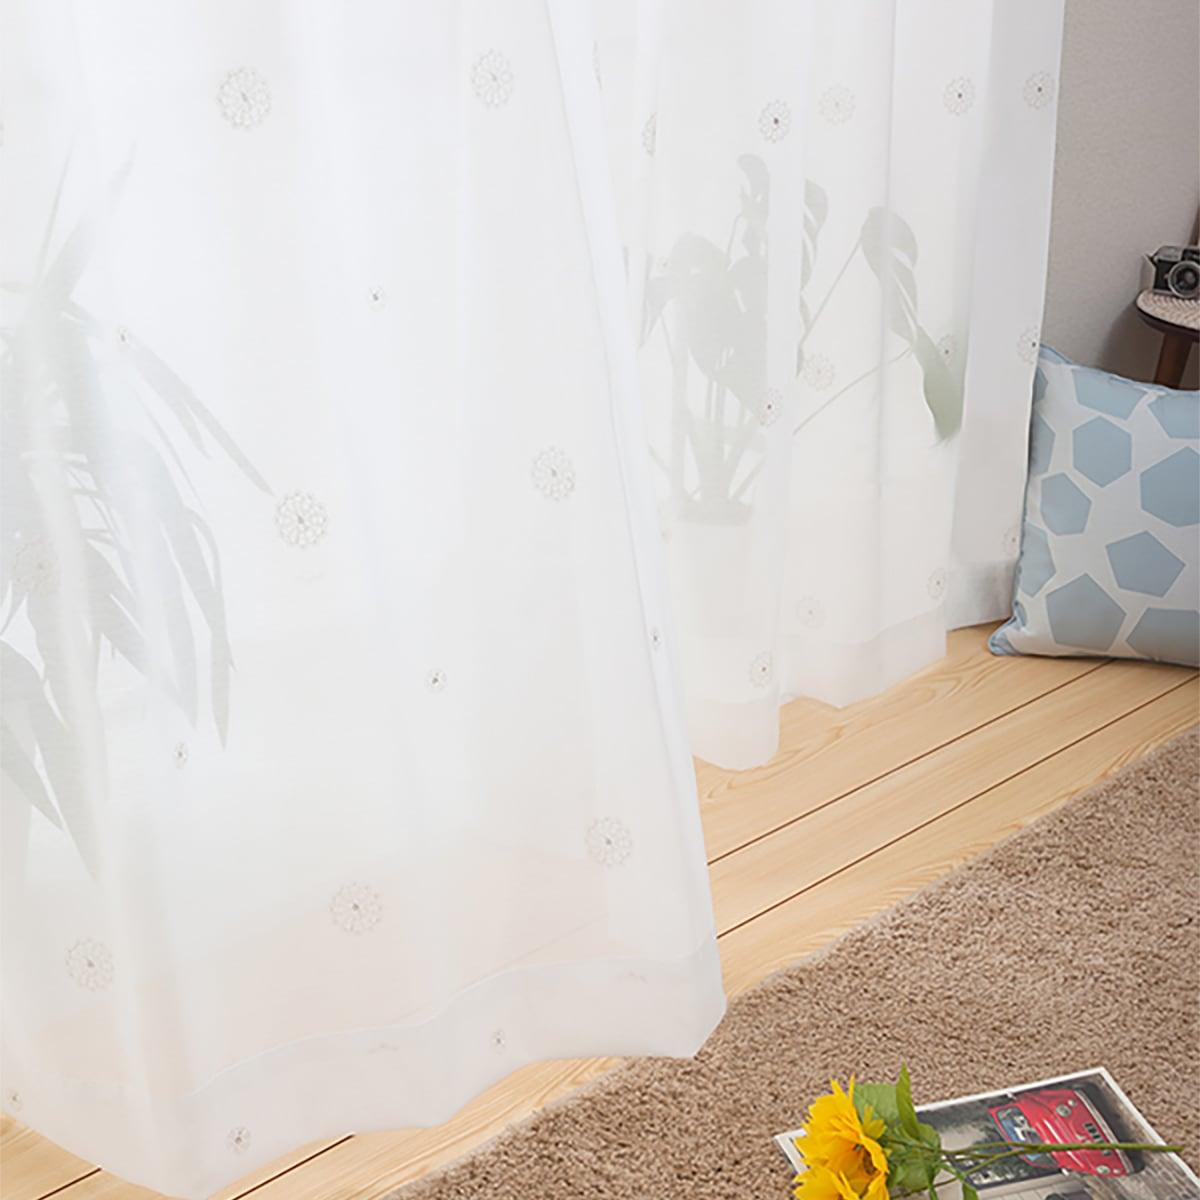 UVカット 洗濯OK アイボリー 100×108 1枚入り 激安格安割引情報満載 レースカーテン 玄関先迄納品 ドイリー 100X108X1 ニトリ 売れ筋ランキング 〔合計金額11000円以上送料無料対象商品〕